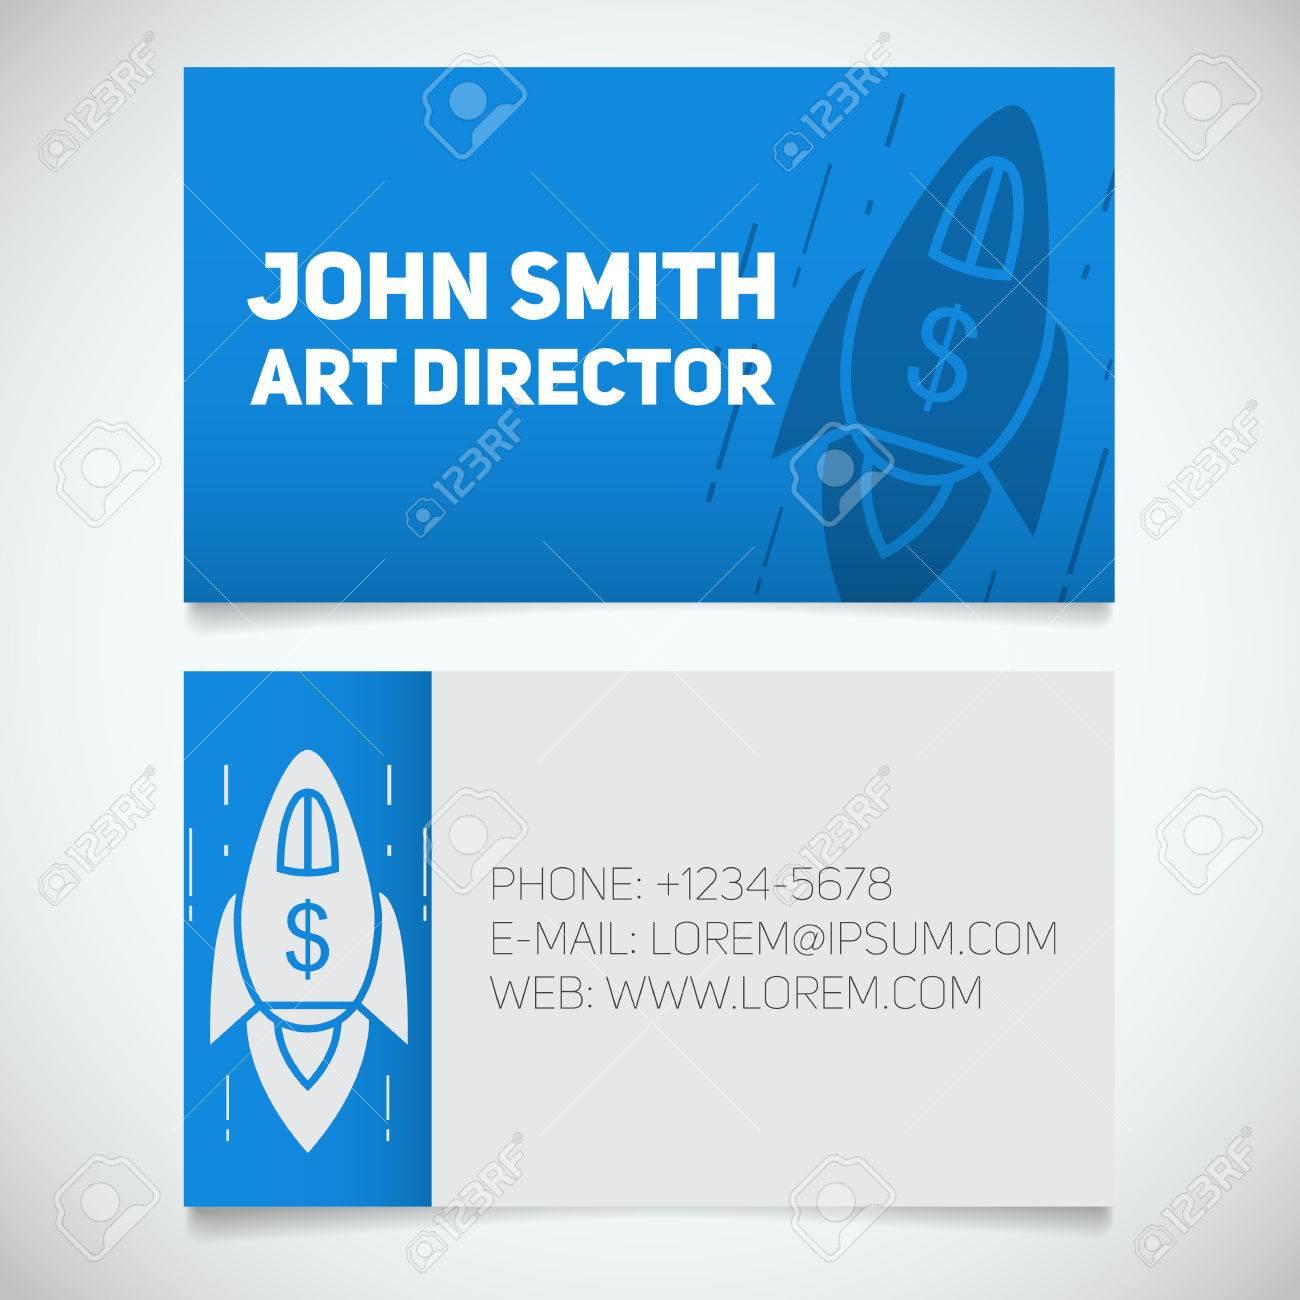 Business Card Print Template. Art Director. Spaceship. Goal ...